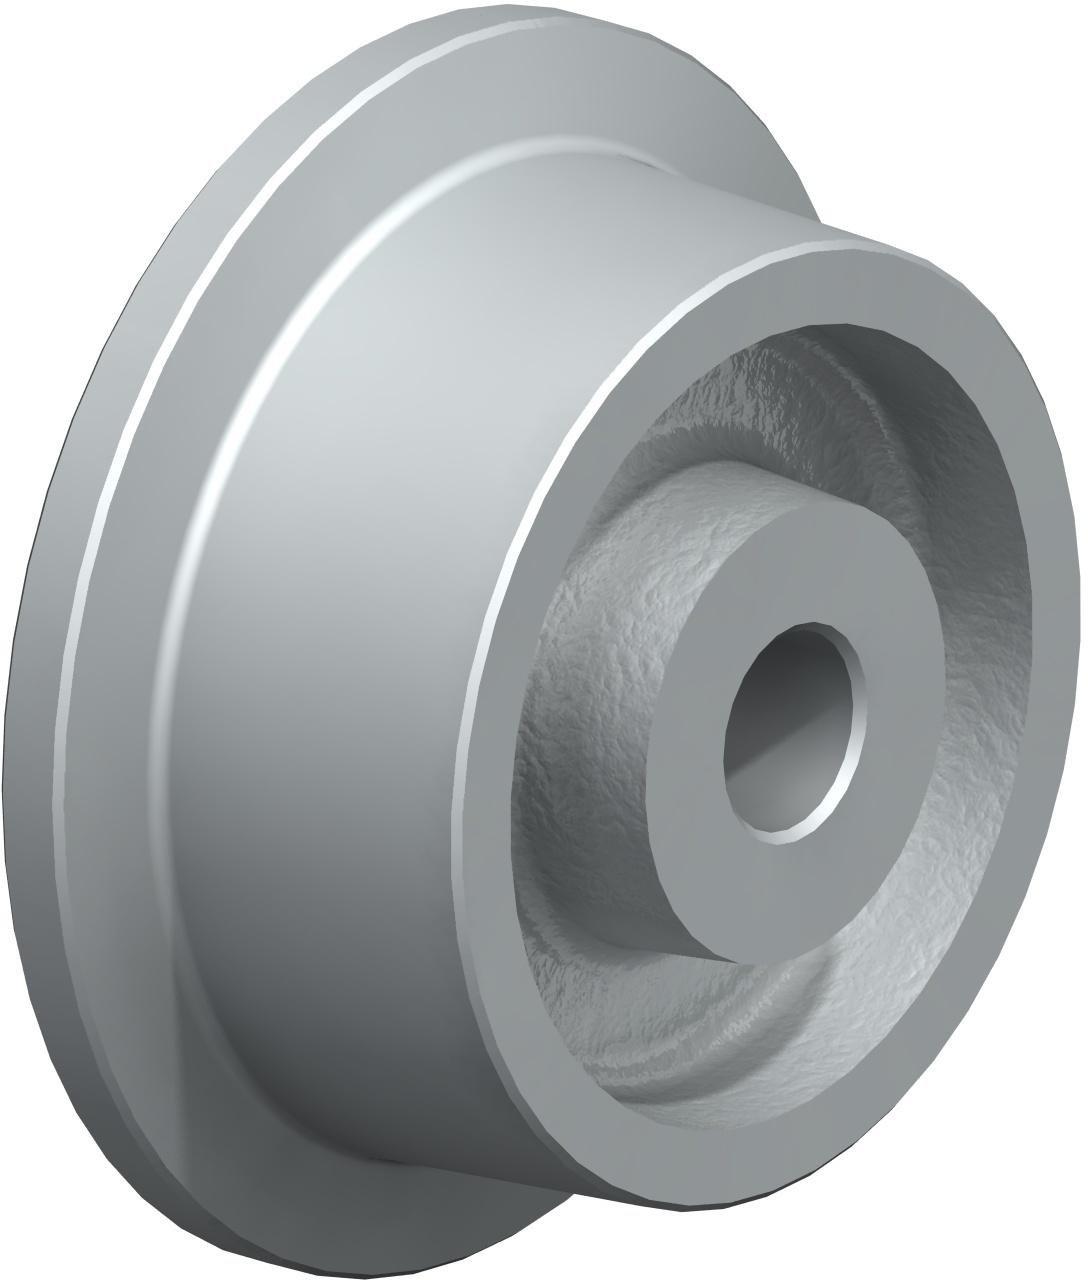 J.W. Winco 100GNB1 Wheel, Gray Cast Iron